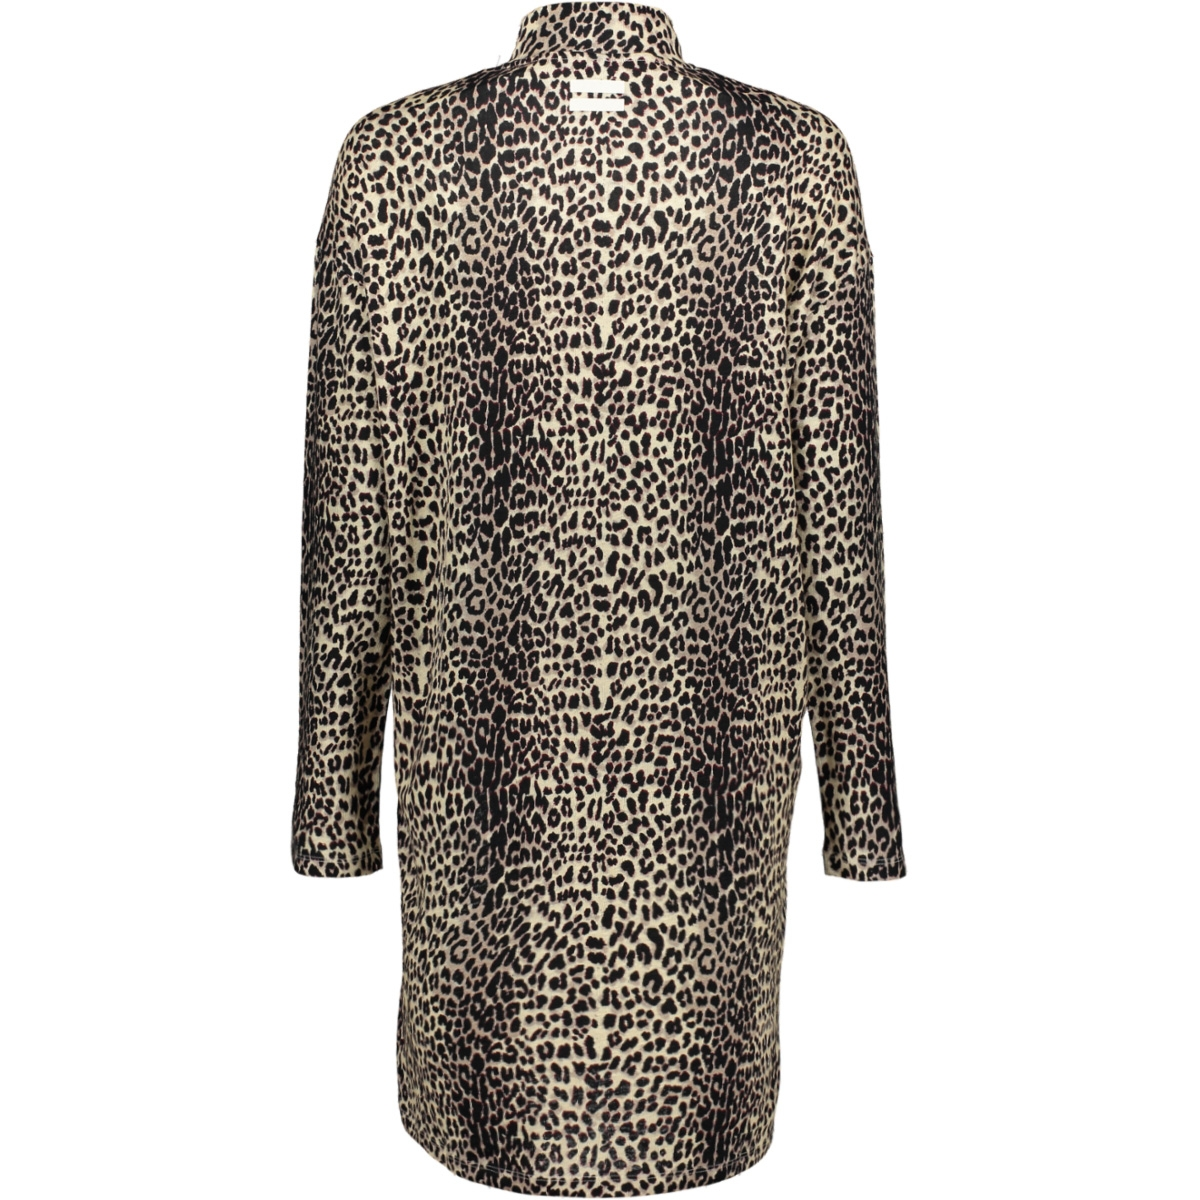 dress leopard 20 346 9103 10 days jurk winter white